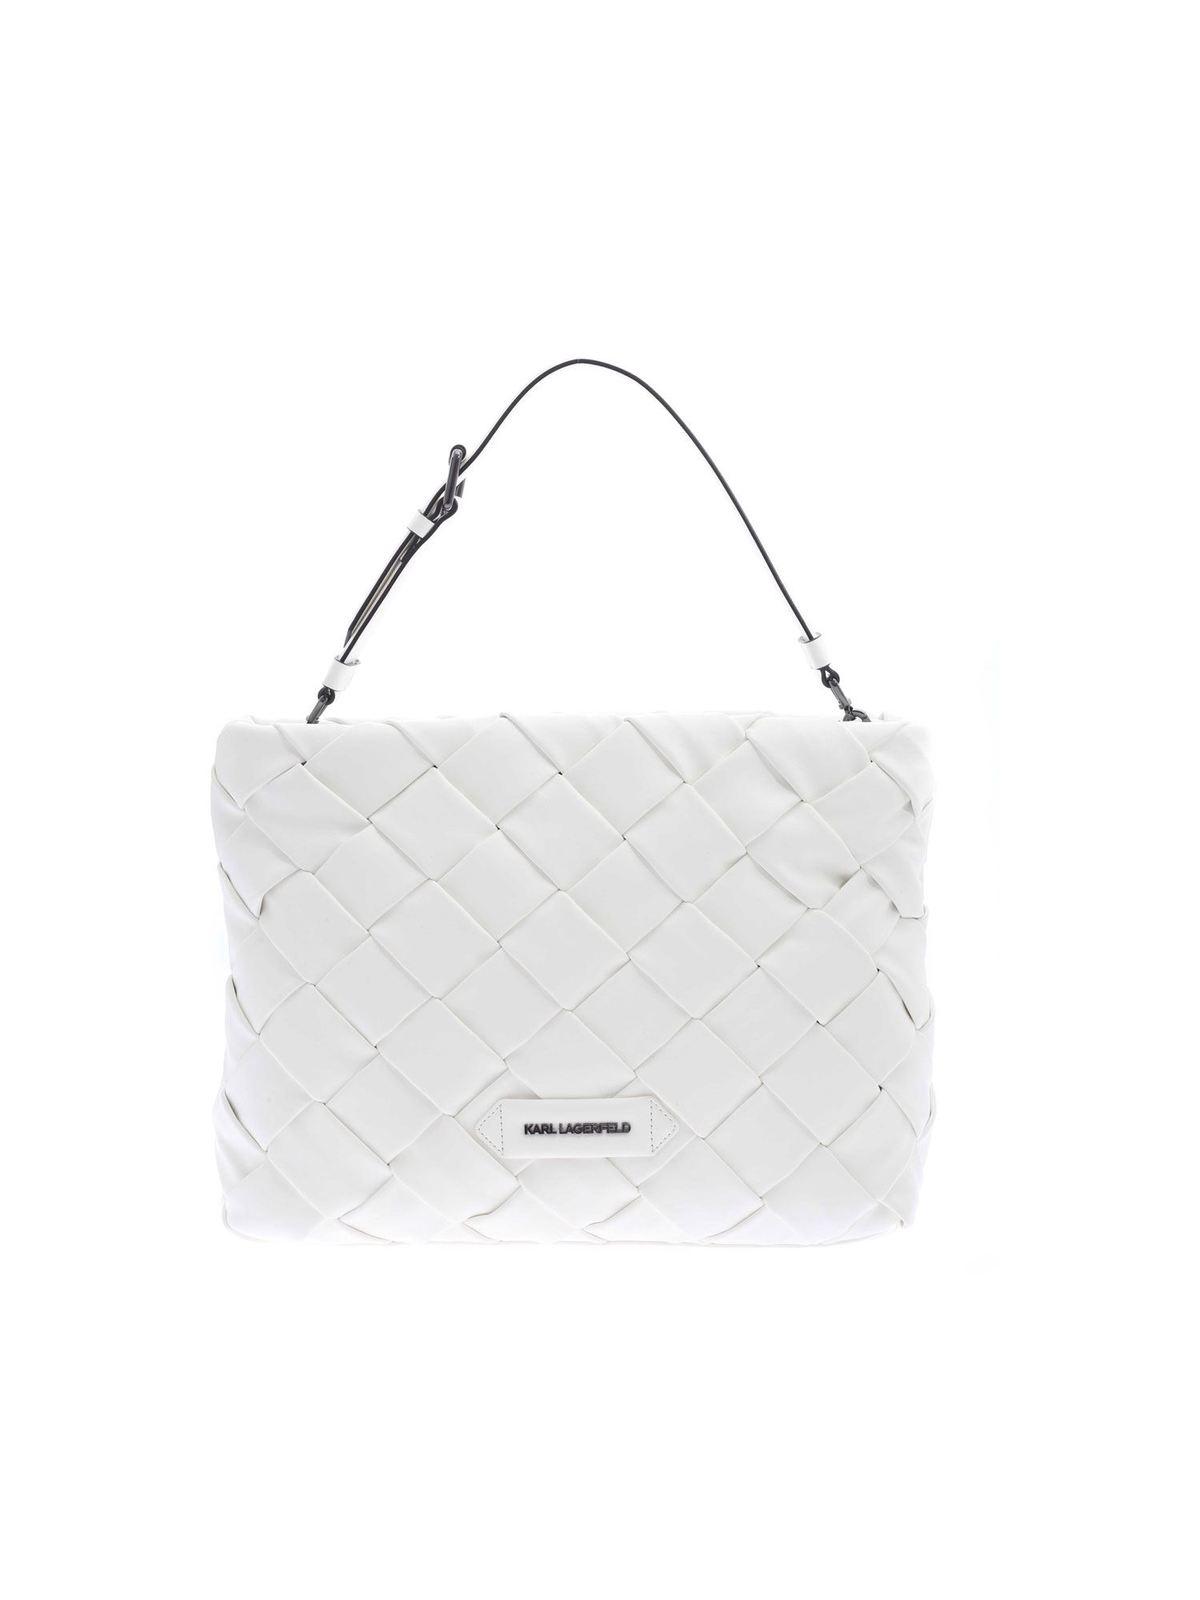 Karl Lagerfeld KKUSHION BRAID CLUTCH BAG IN WHITE